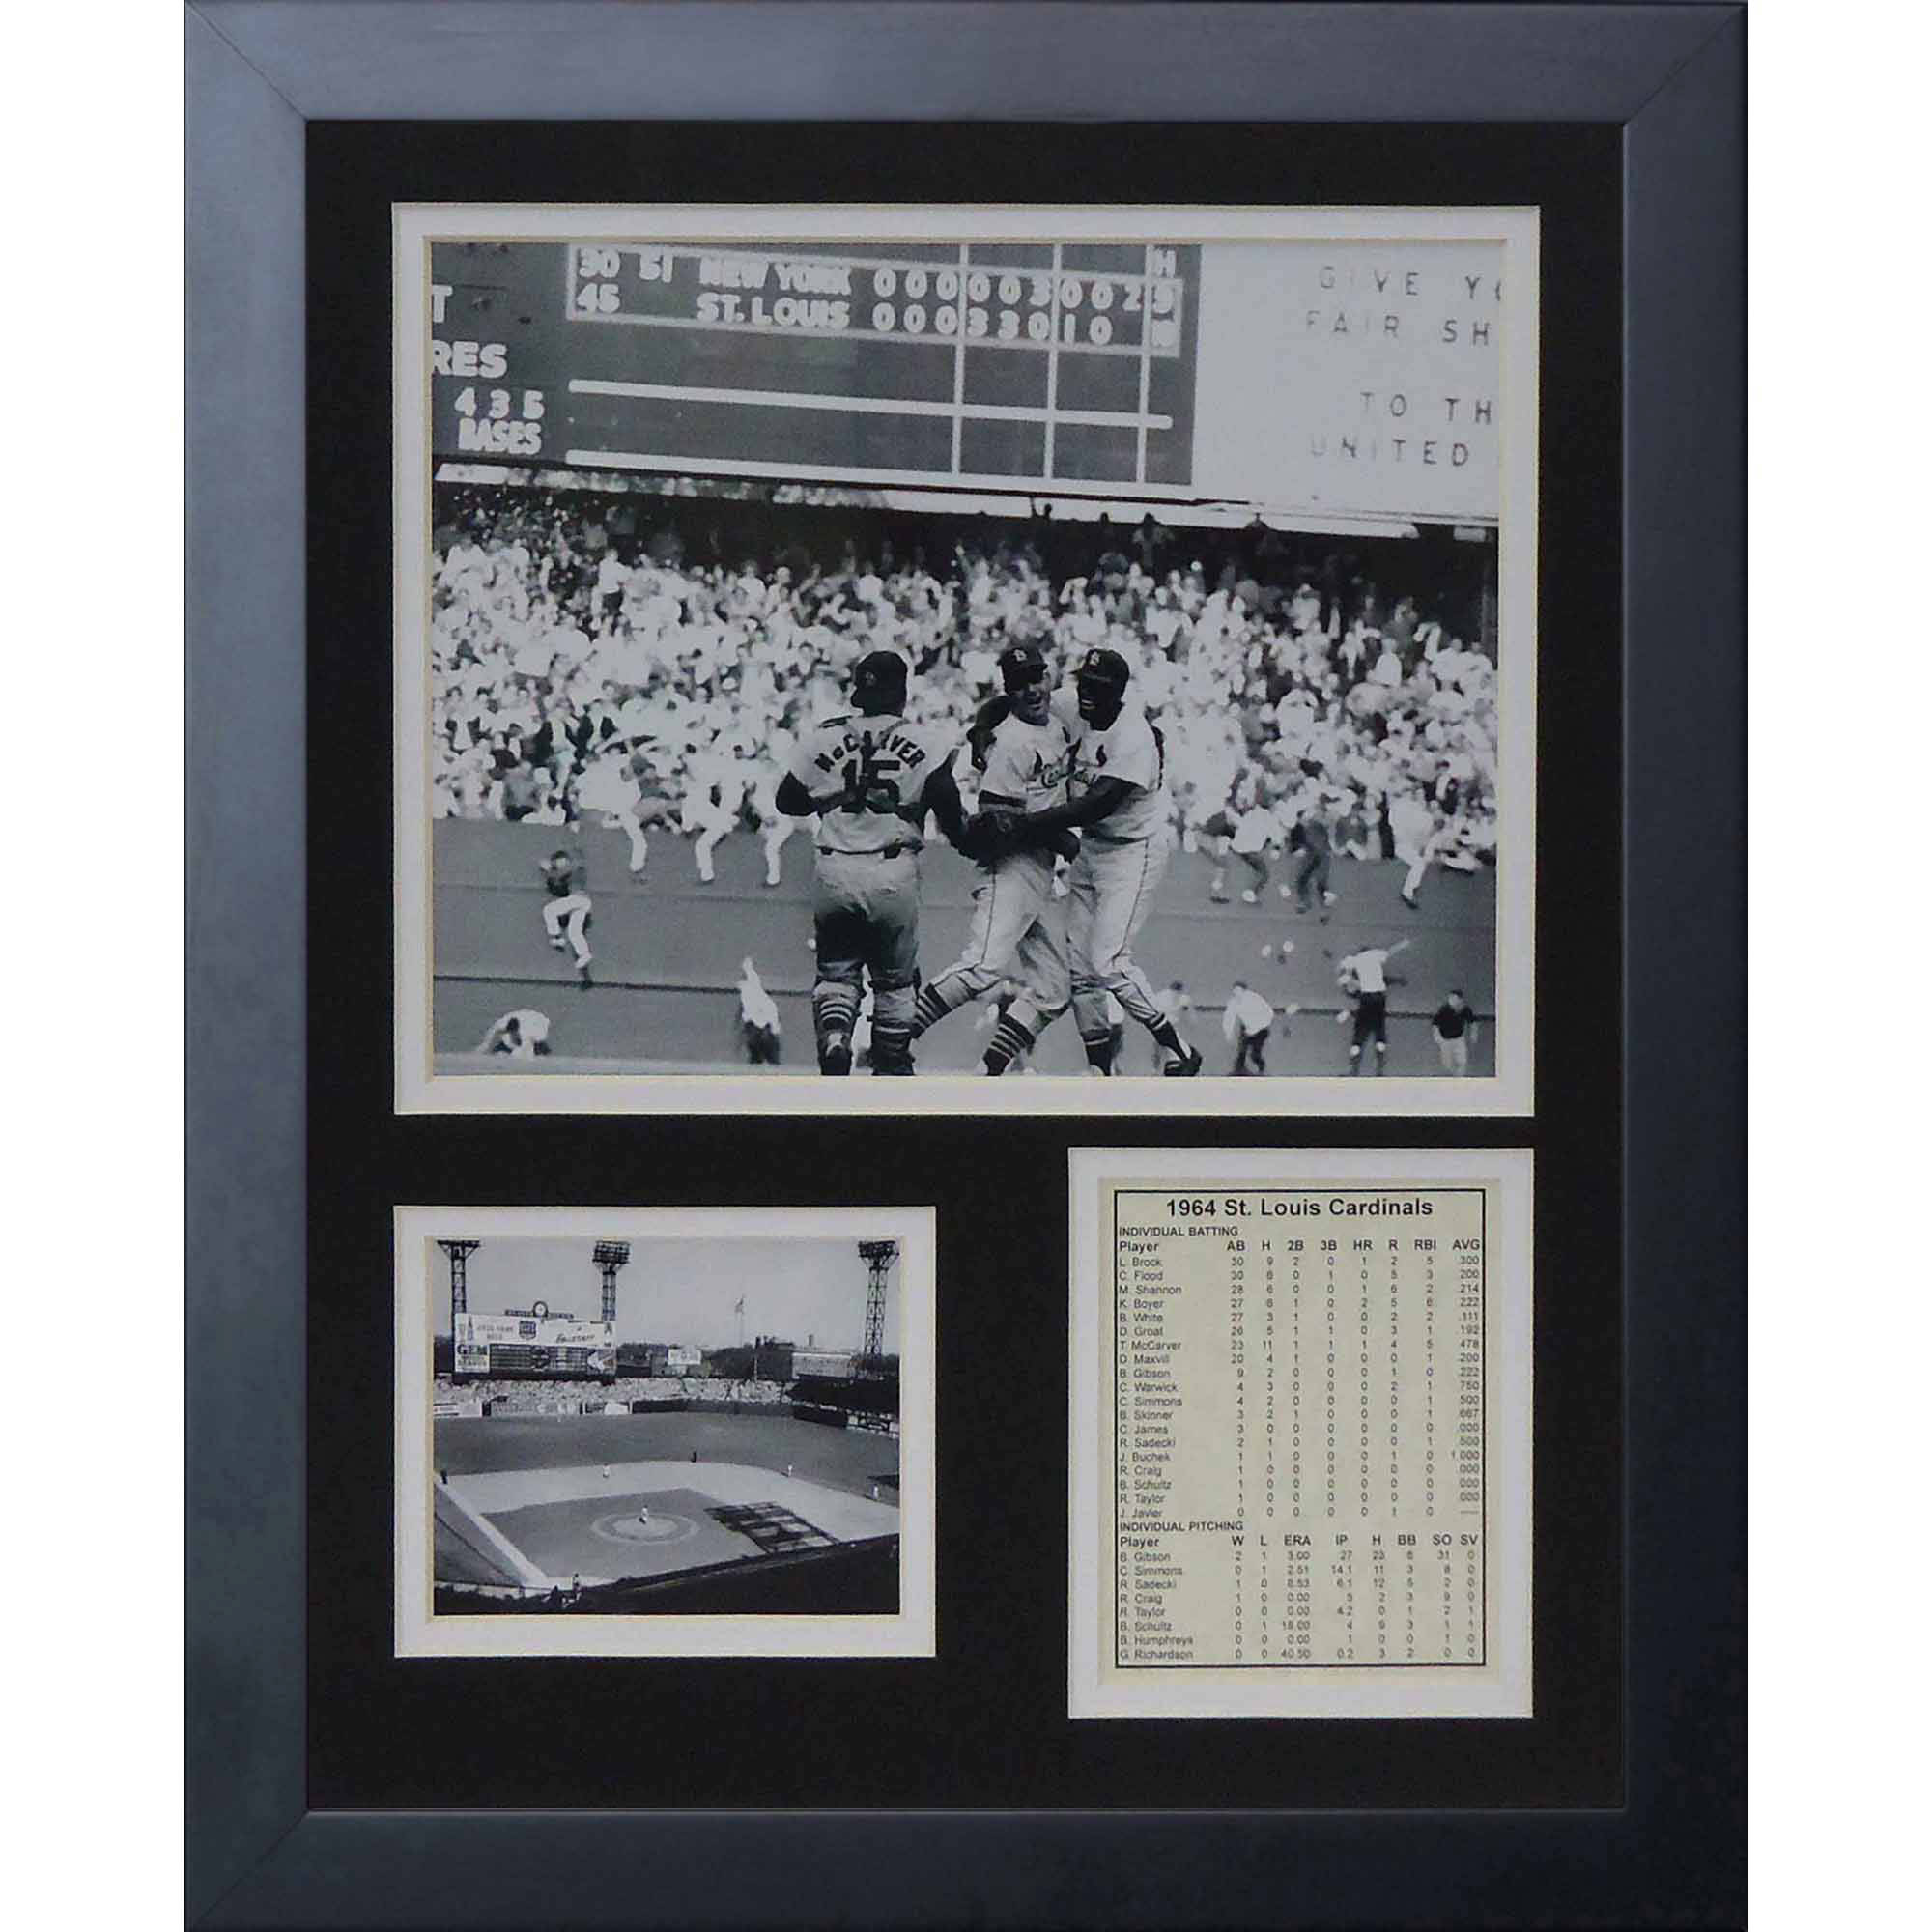 "Legends Never Die 1964 St. Louis Cardinals Celebration Framed Photo Collage, 11"" x 14"""